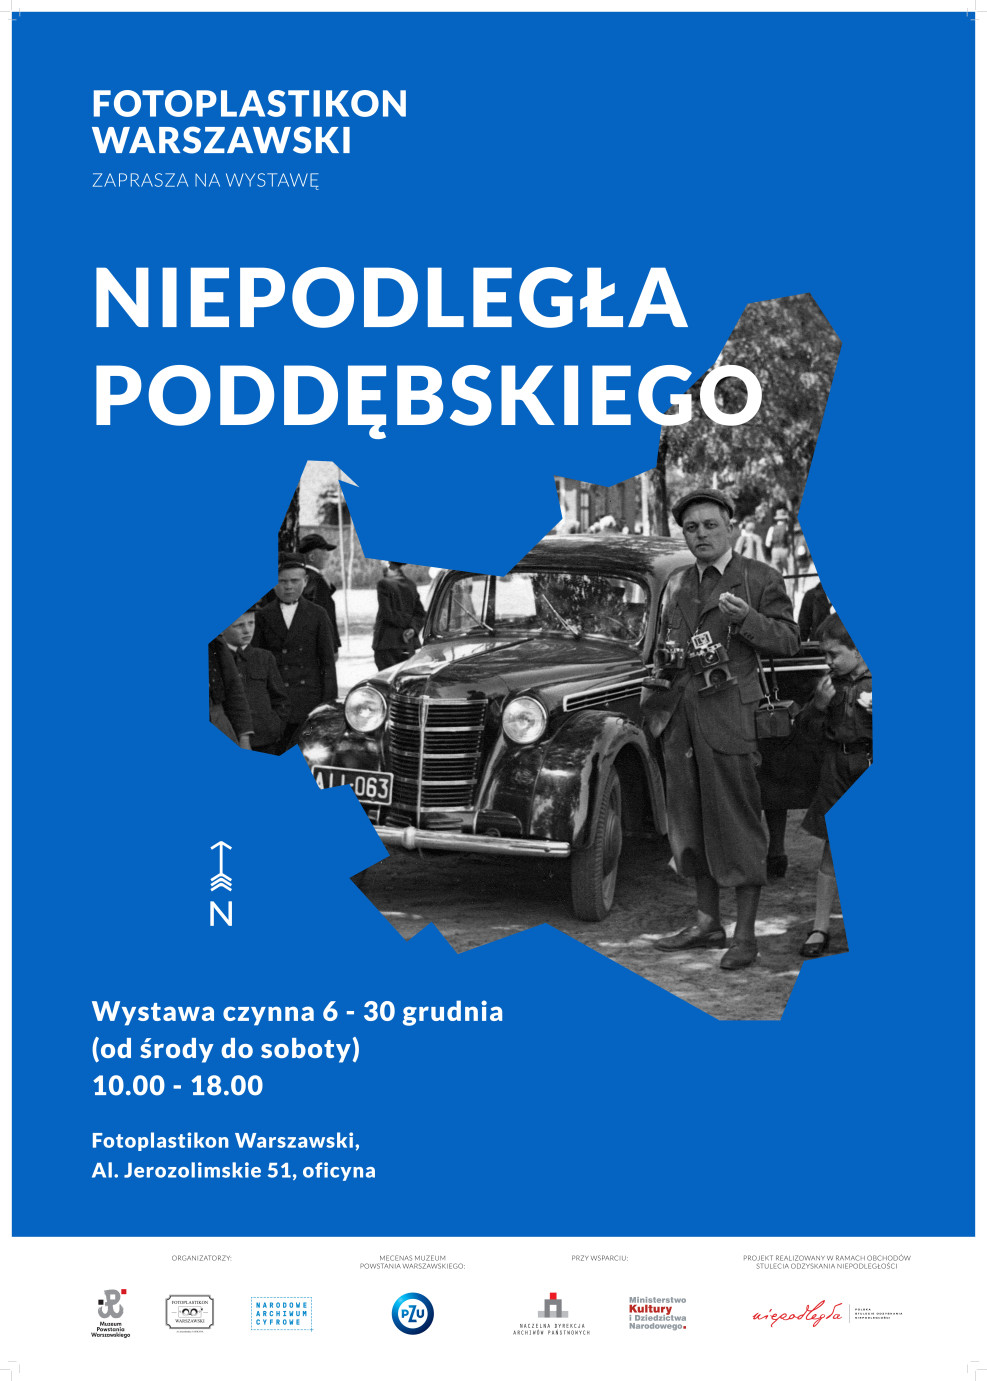 Fotoplastikon - plakat Poddebski A1 (2)